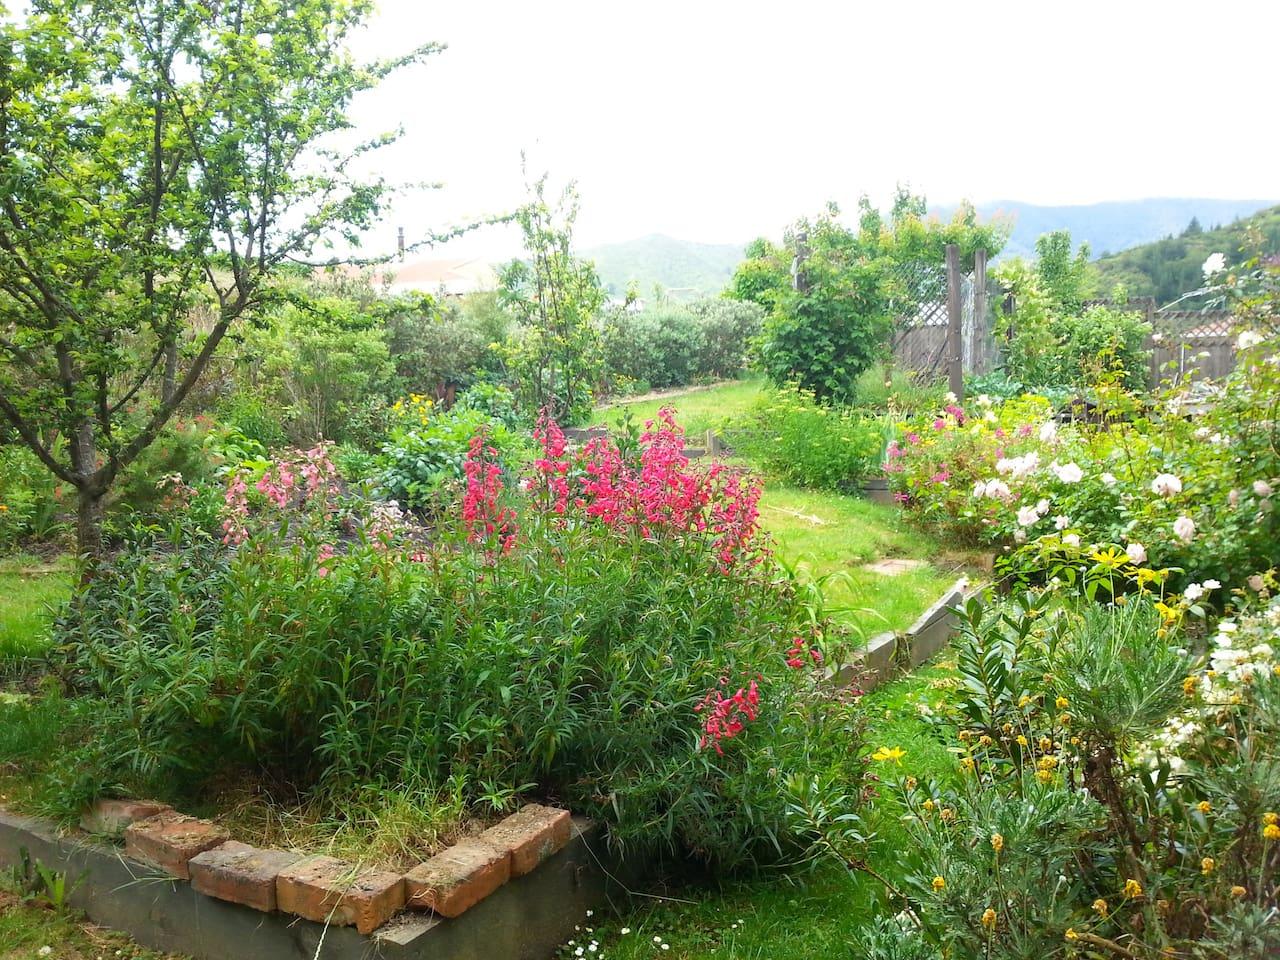 Garden out back summertime